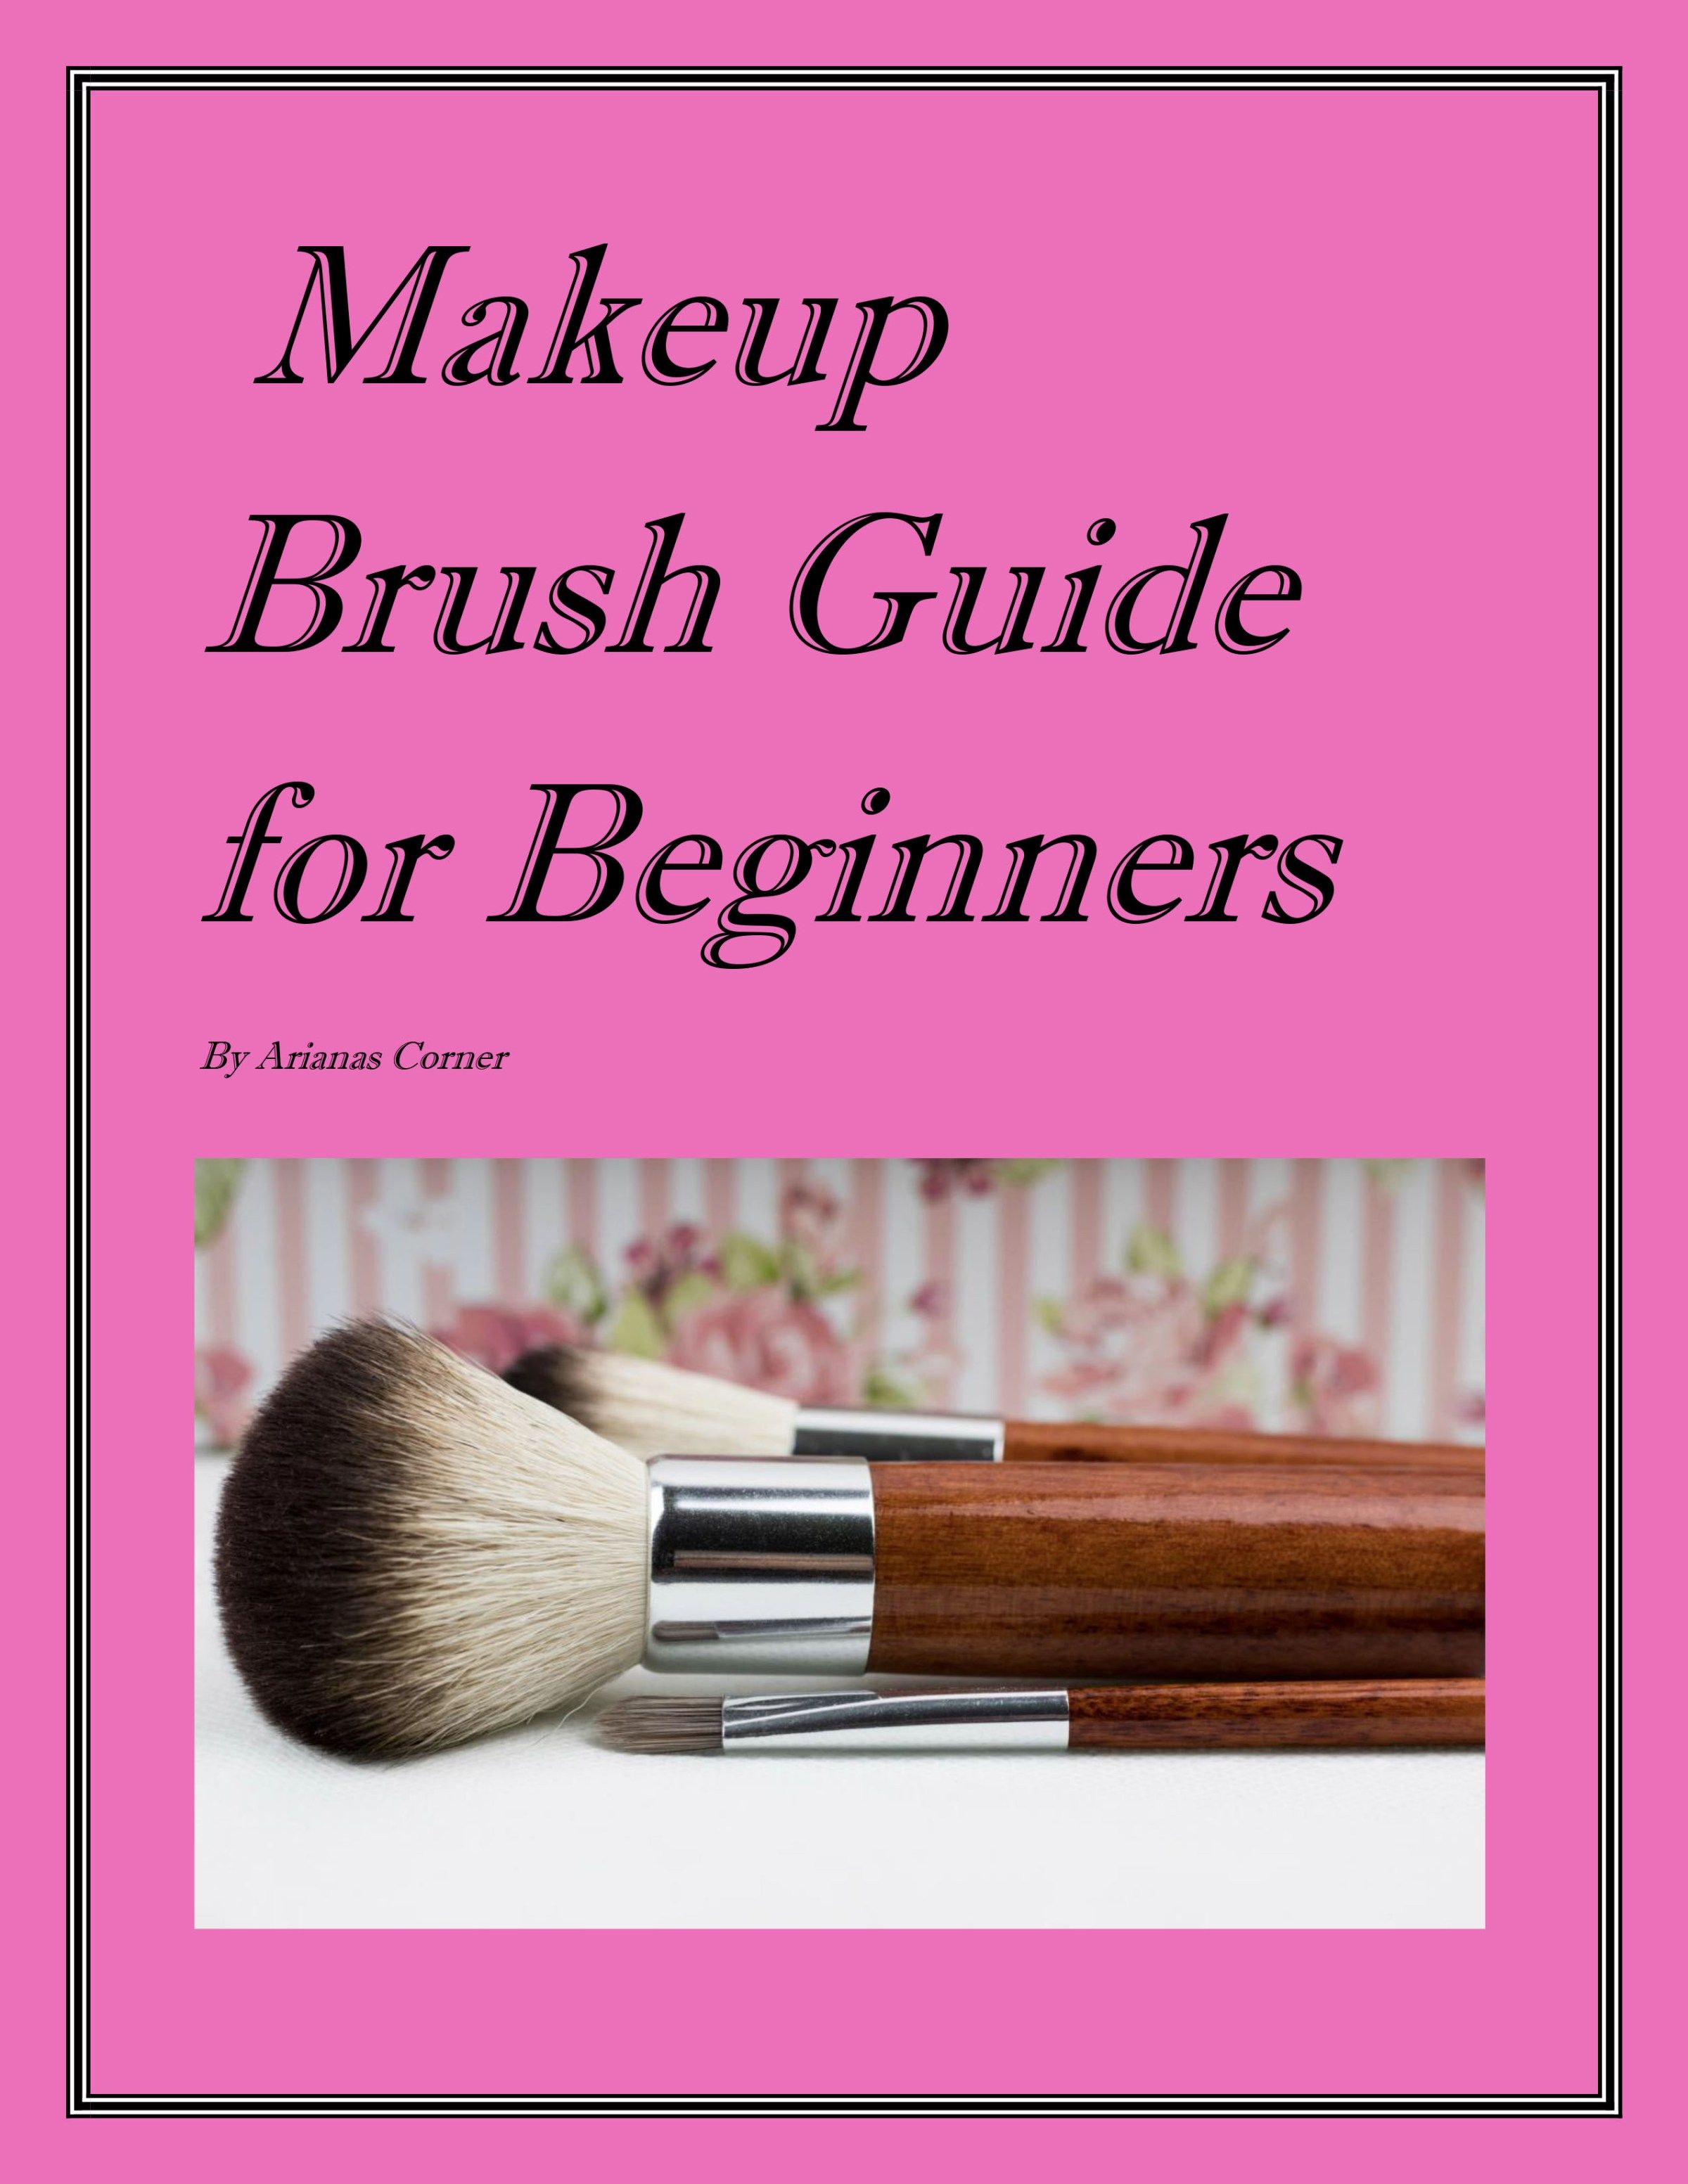 Makeup Brush Guide for Beginners Makeup brushes guide